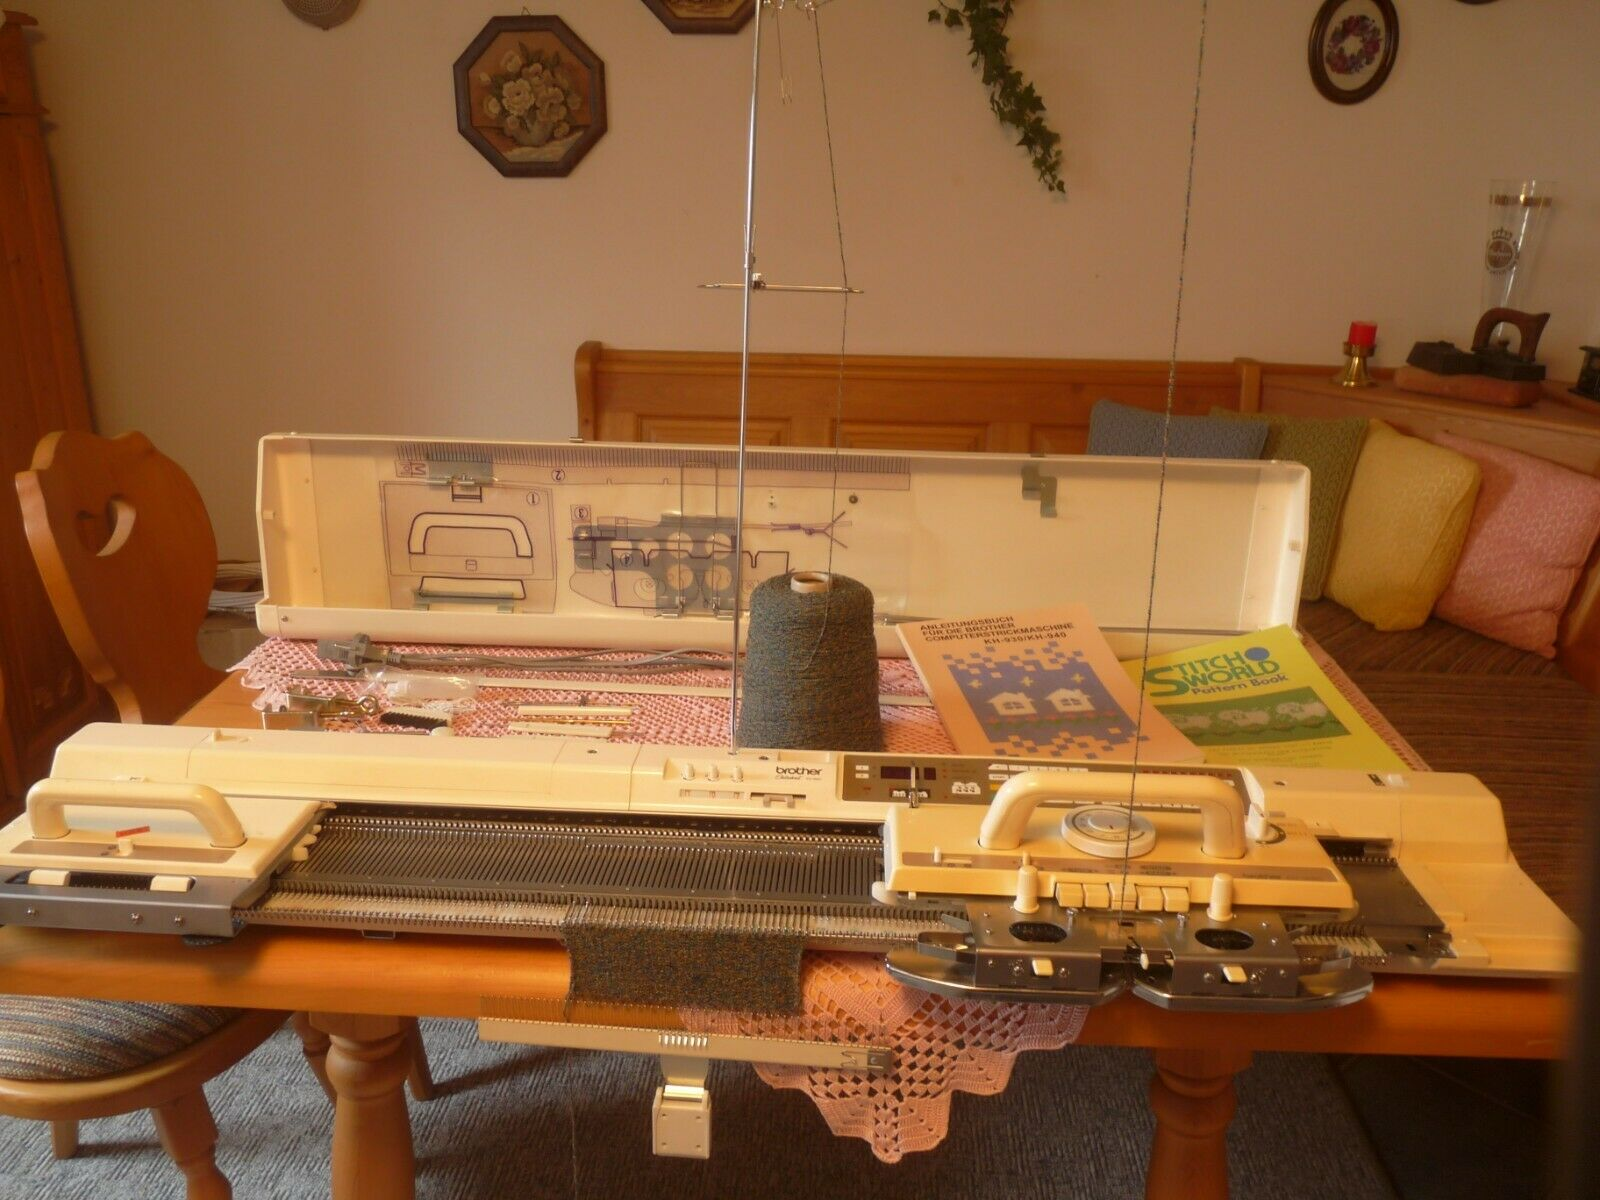 350x KH868 Nadel Brother Strickmaschine Knittingmachine needles вязальная машина